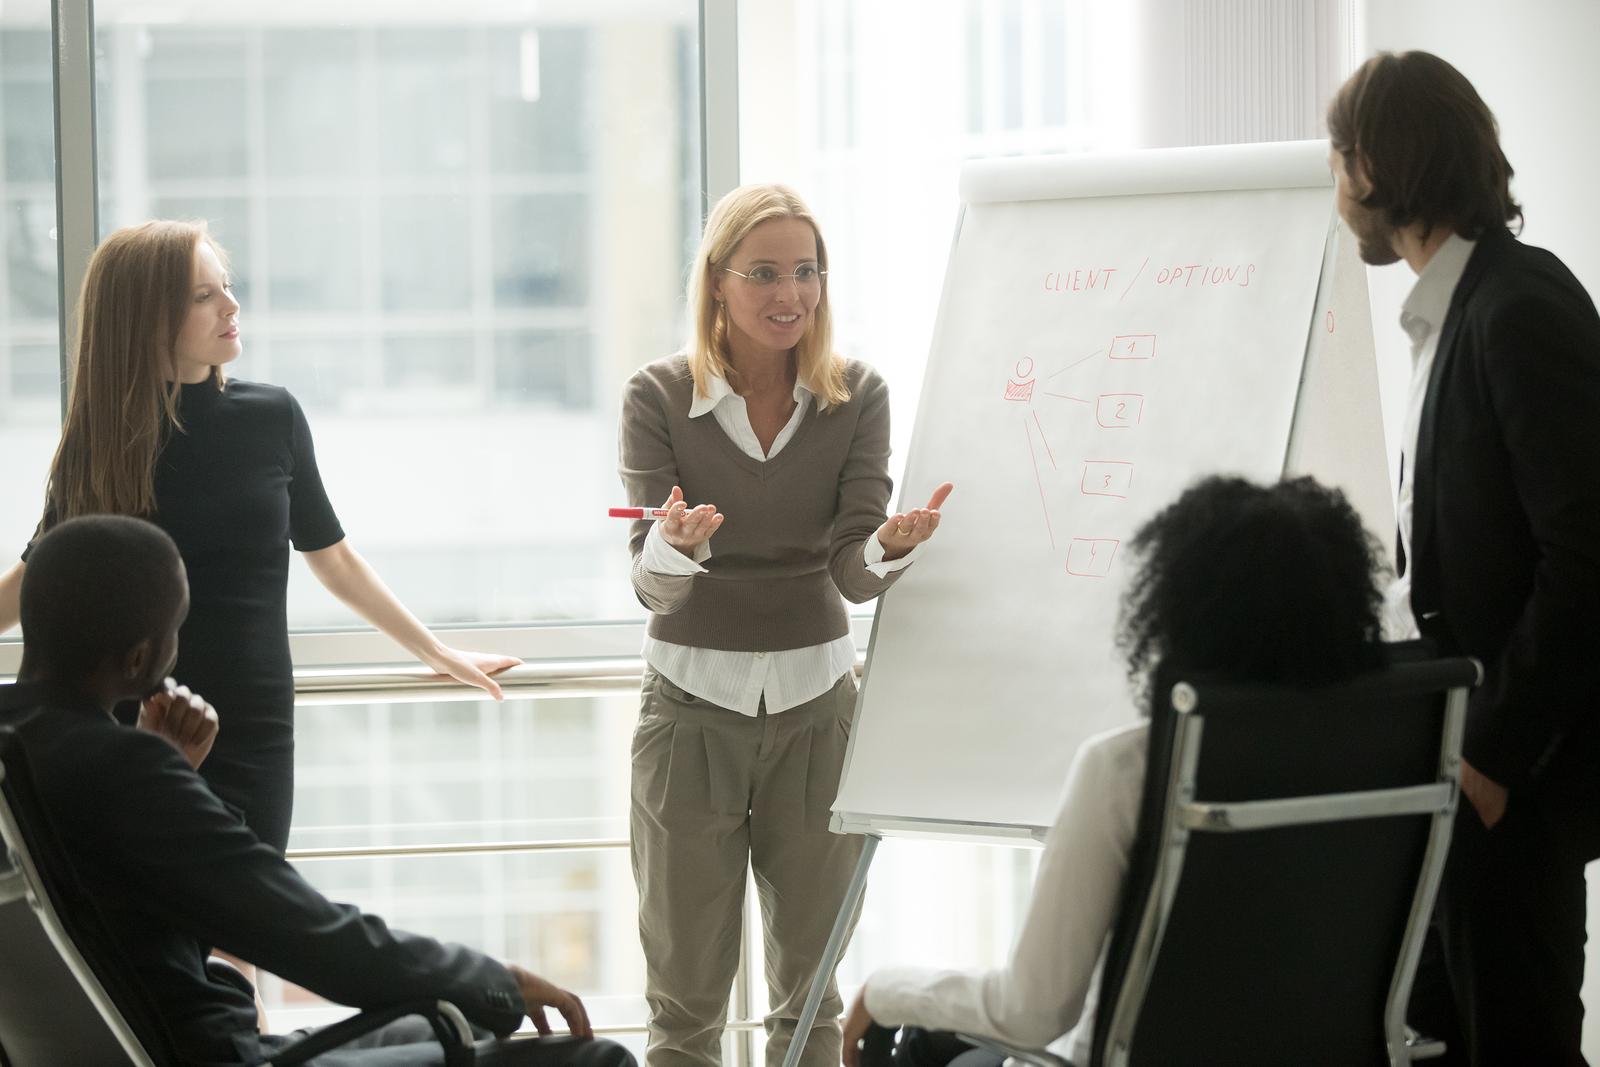 bigstock-Female-Team-Leader-Or-Business-229505212